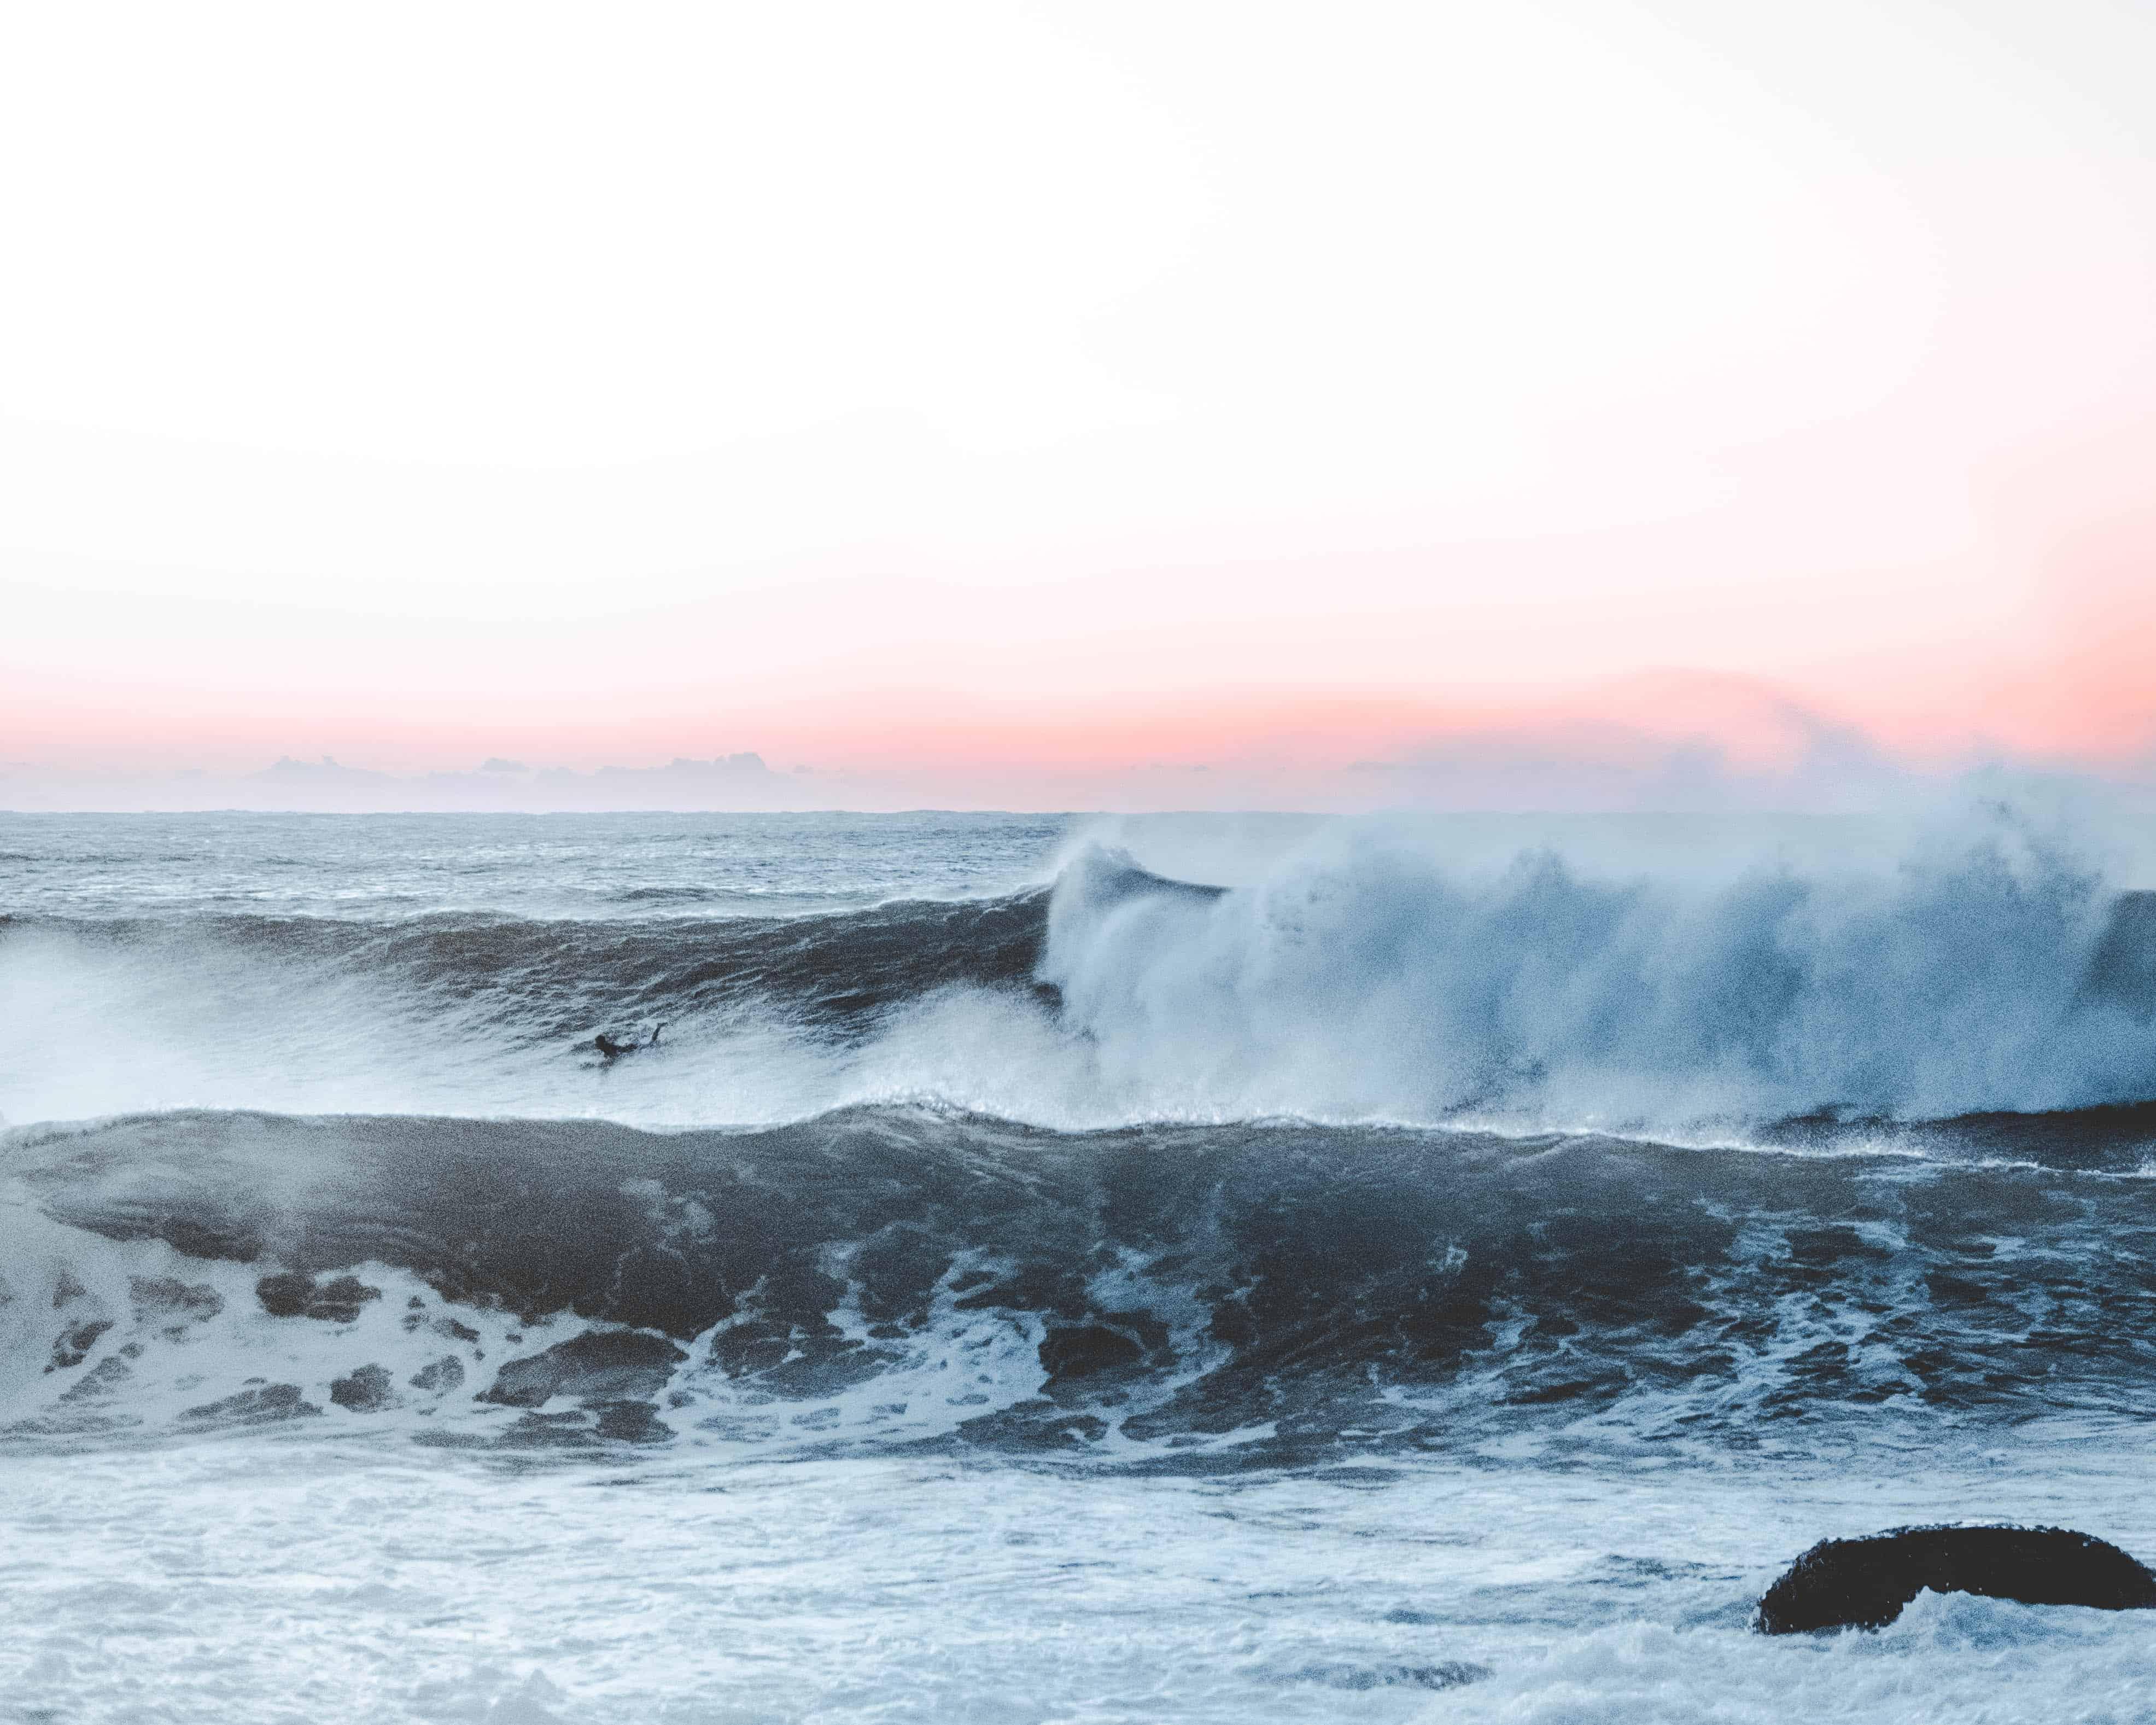 Bølger - Foto: Sacha Styles